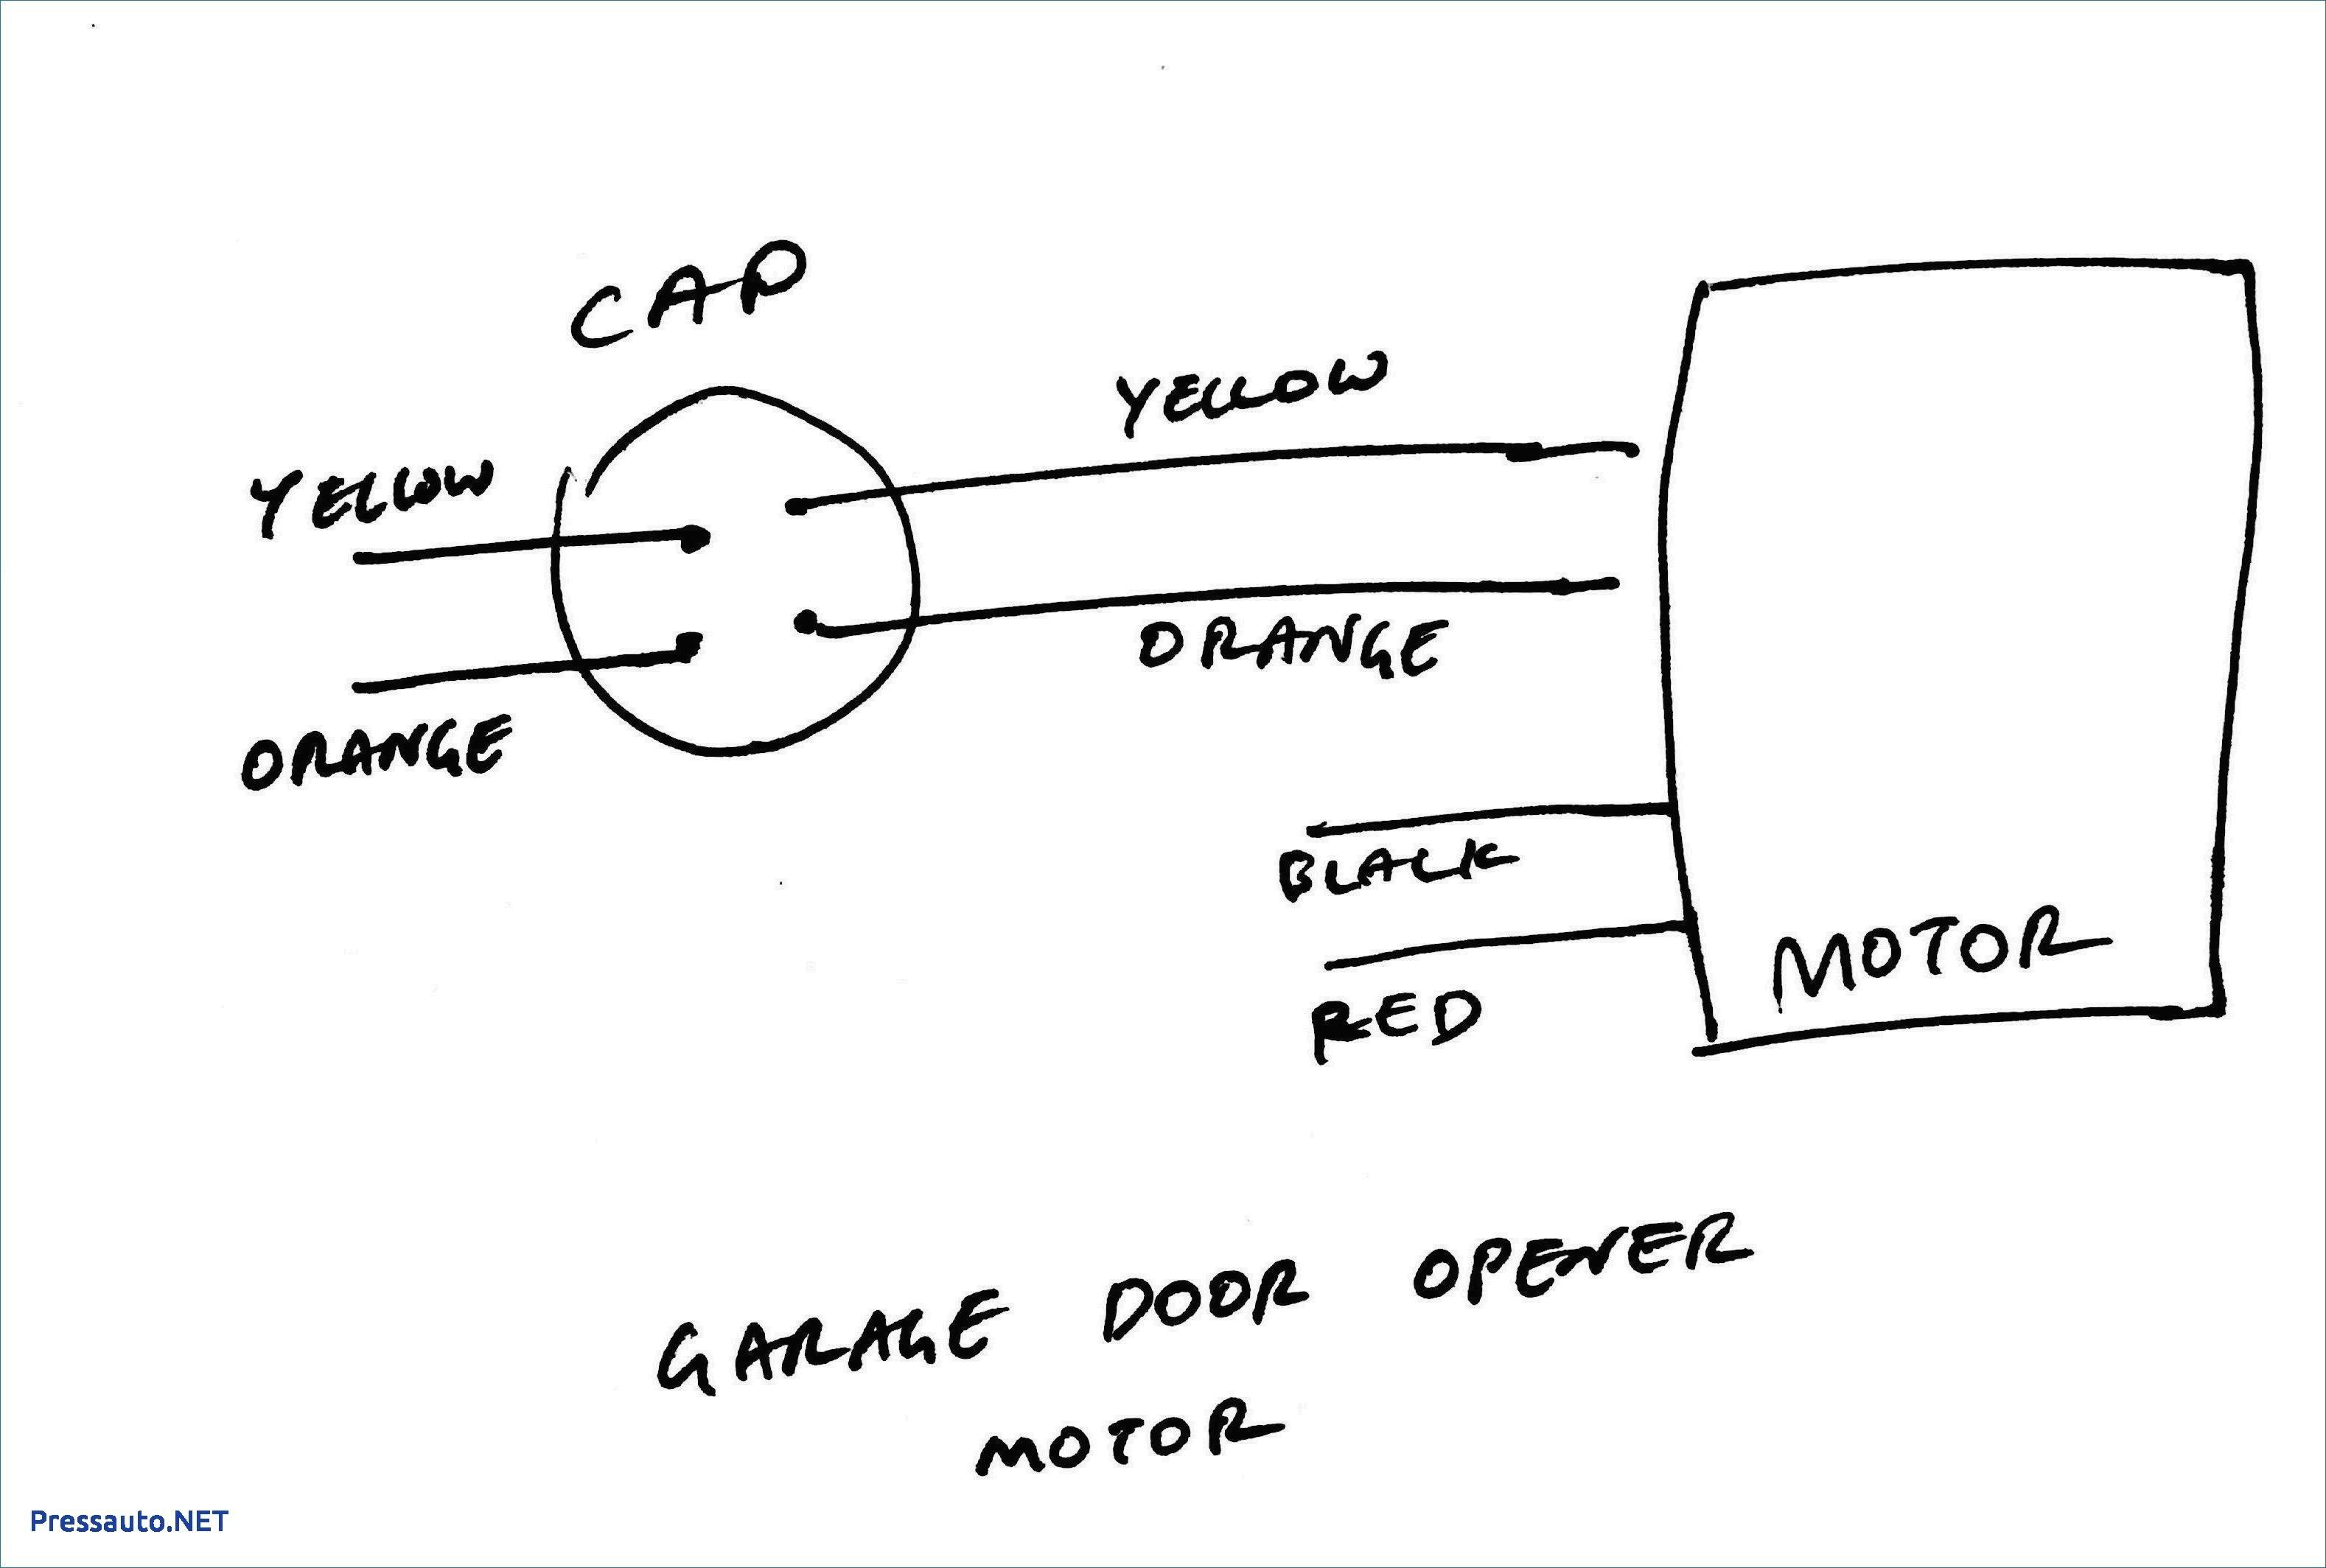 3 Wire Condenser Fan Motor Wiring Diagram Inspirational Fantastic Ac Fan Motor Wiring Diagram Gallery Electrical